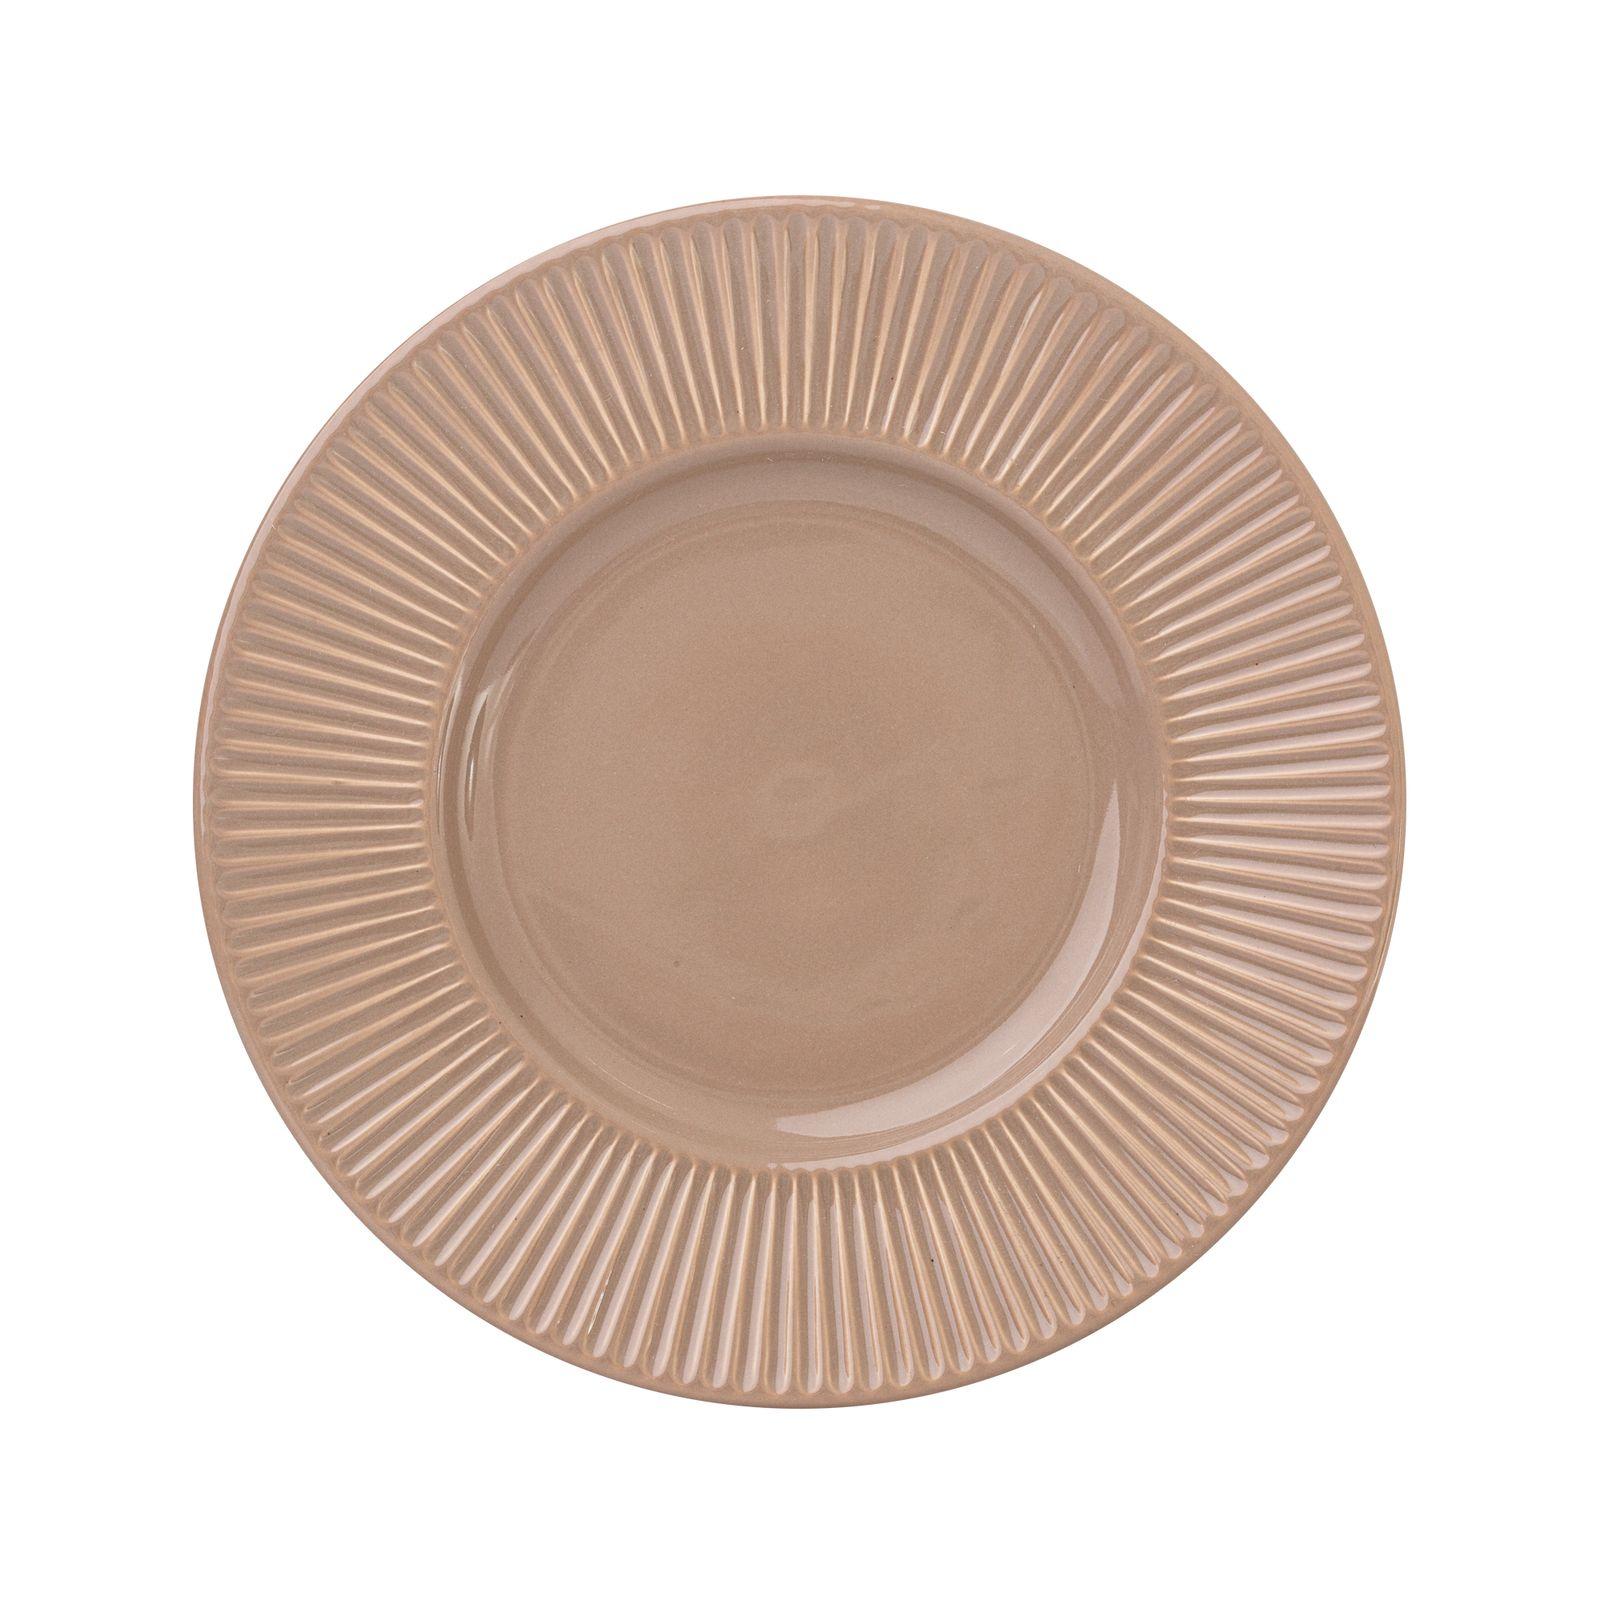 Talerz deserowy Palette Taupe 22,5 cm AMBITION